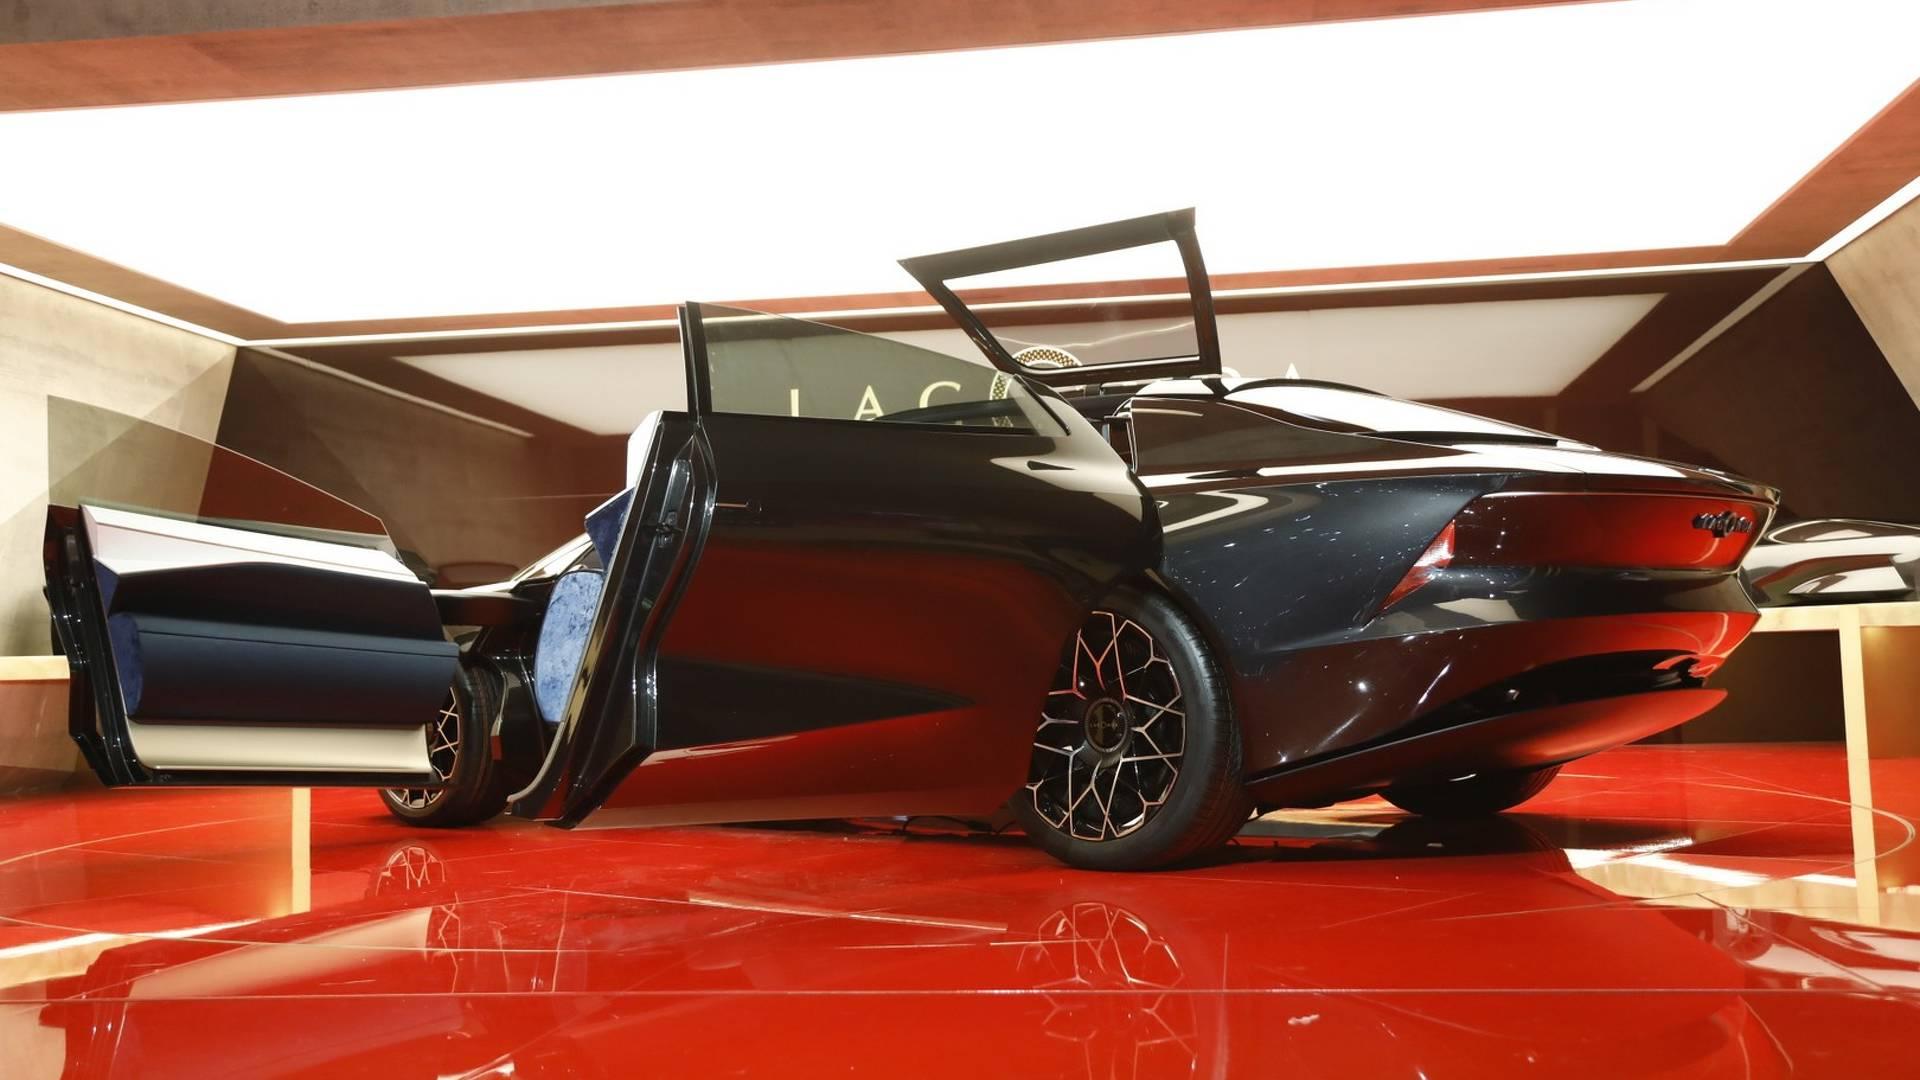 Lagonda Vision